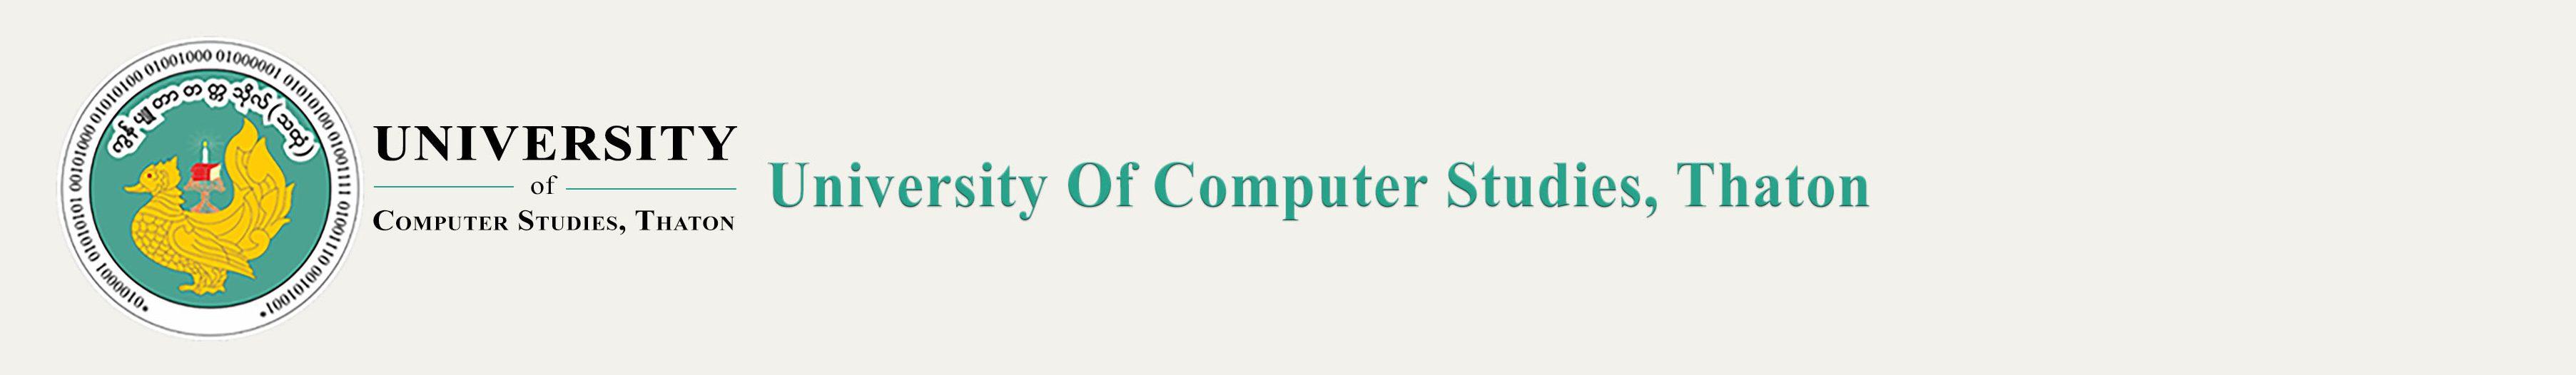 University Of Computer Studies Thaton